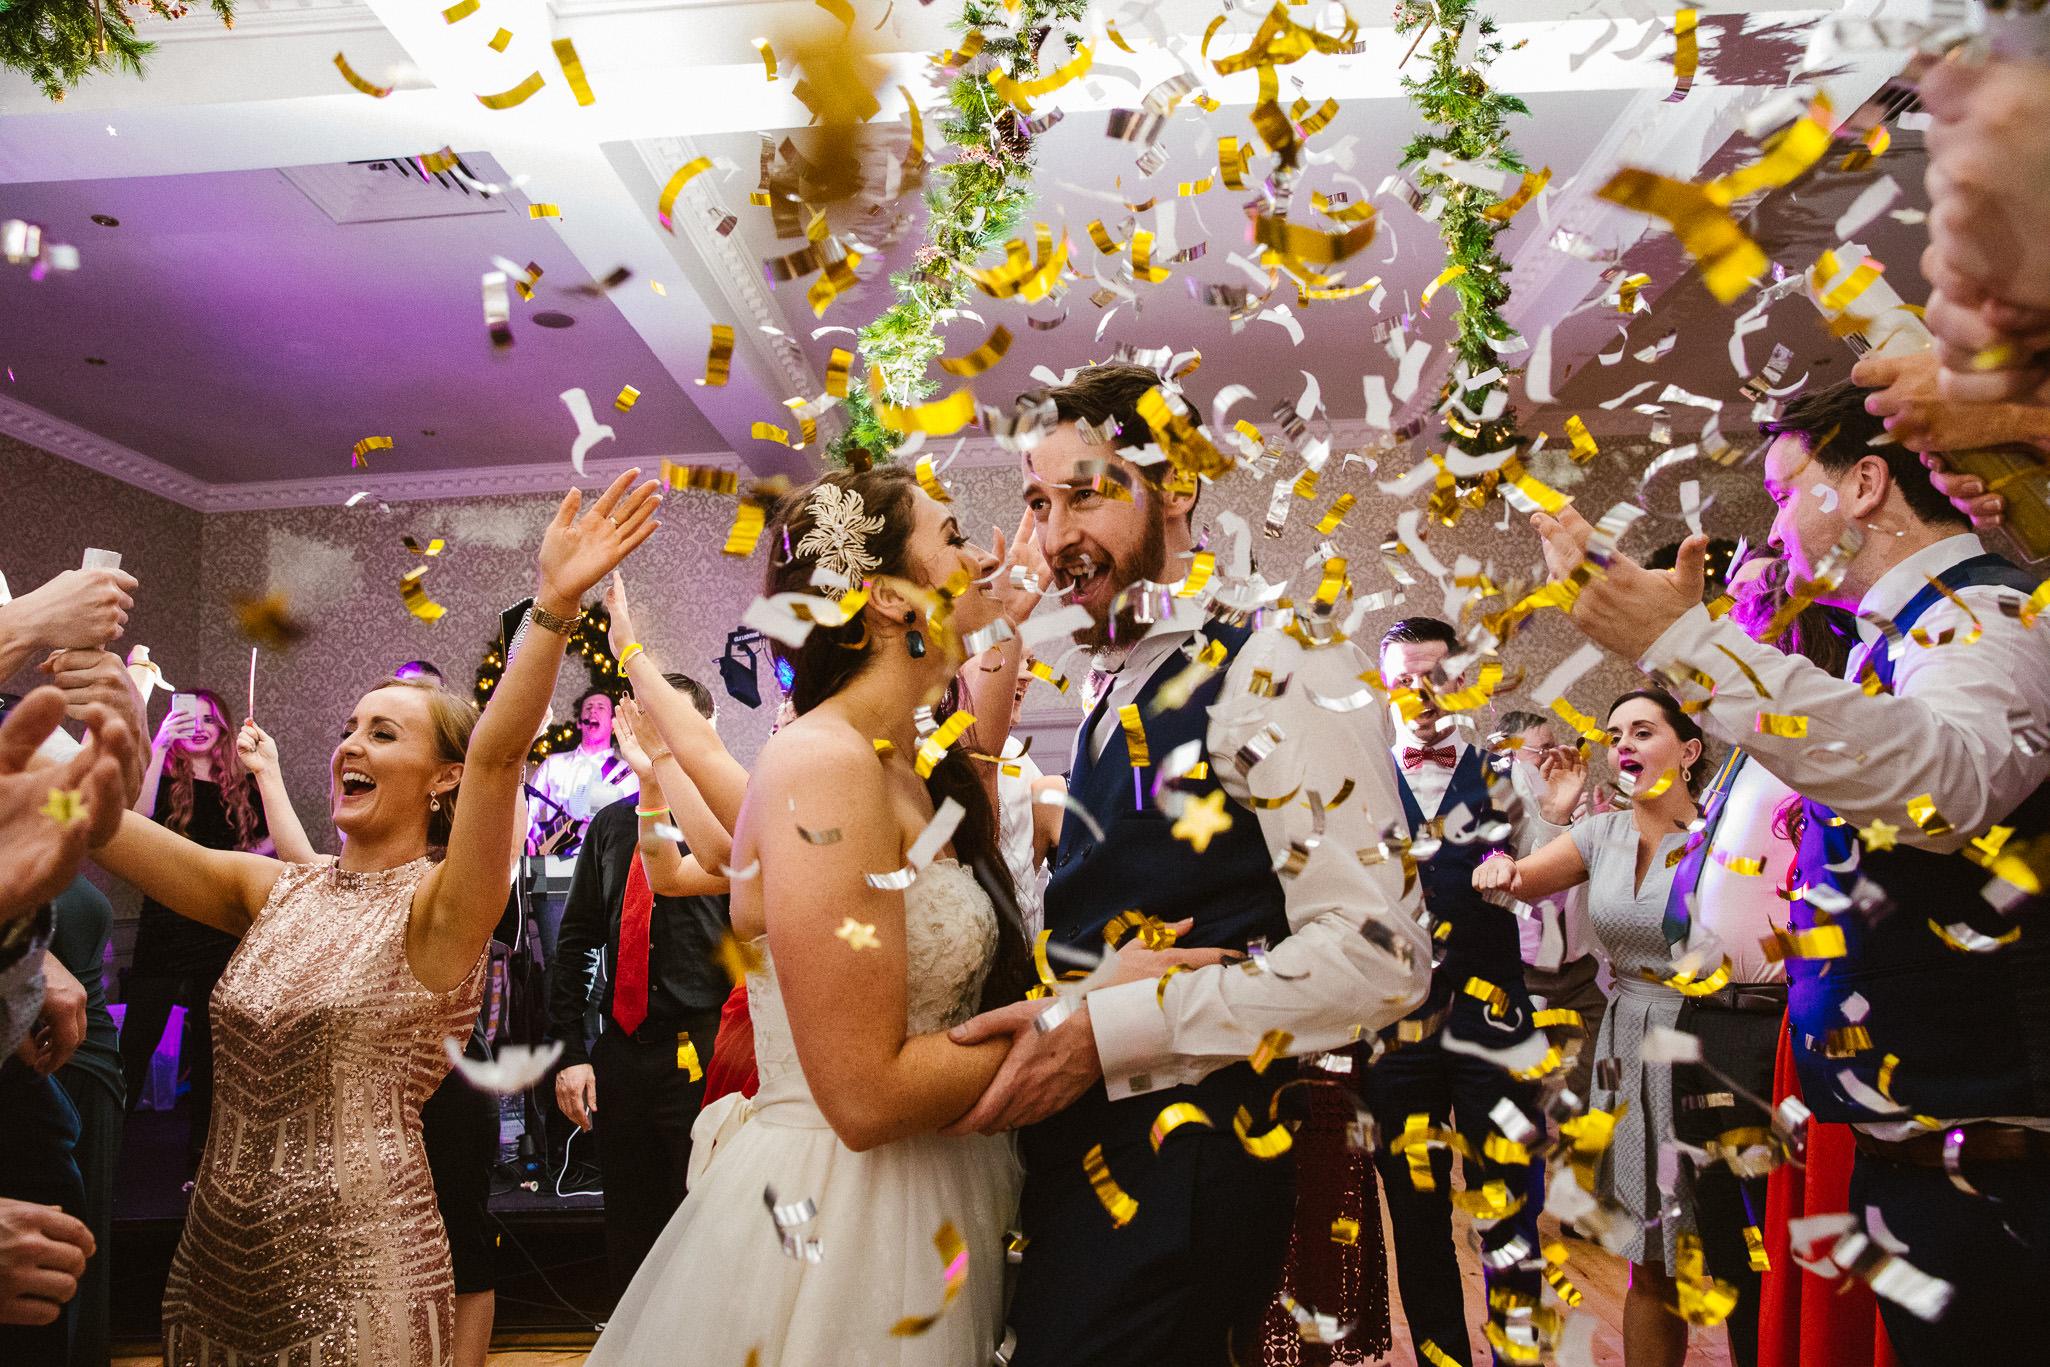 clairebyrnephotography-wedding-night-sparklers-new-years-eve-denyce-leonard-29.jpg